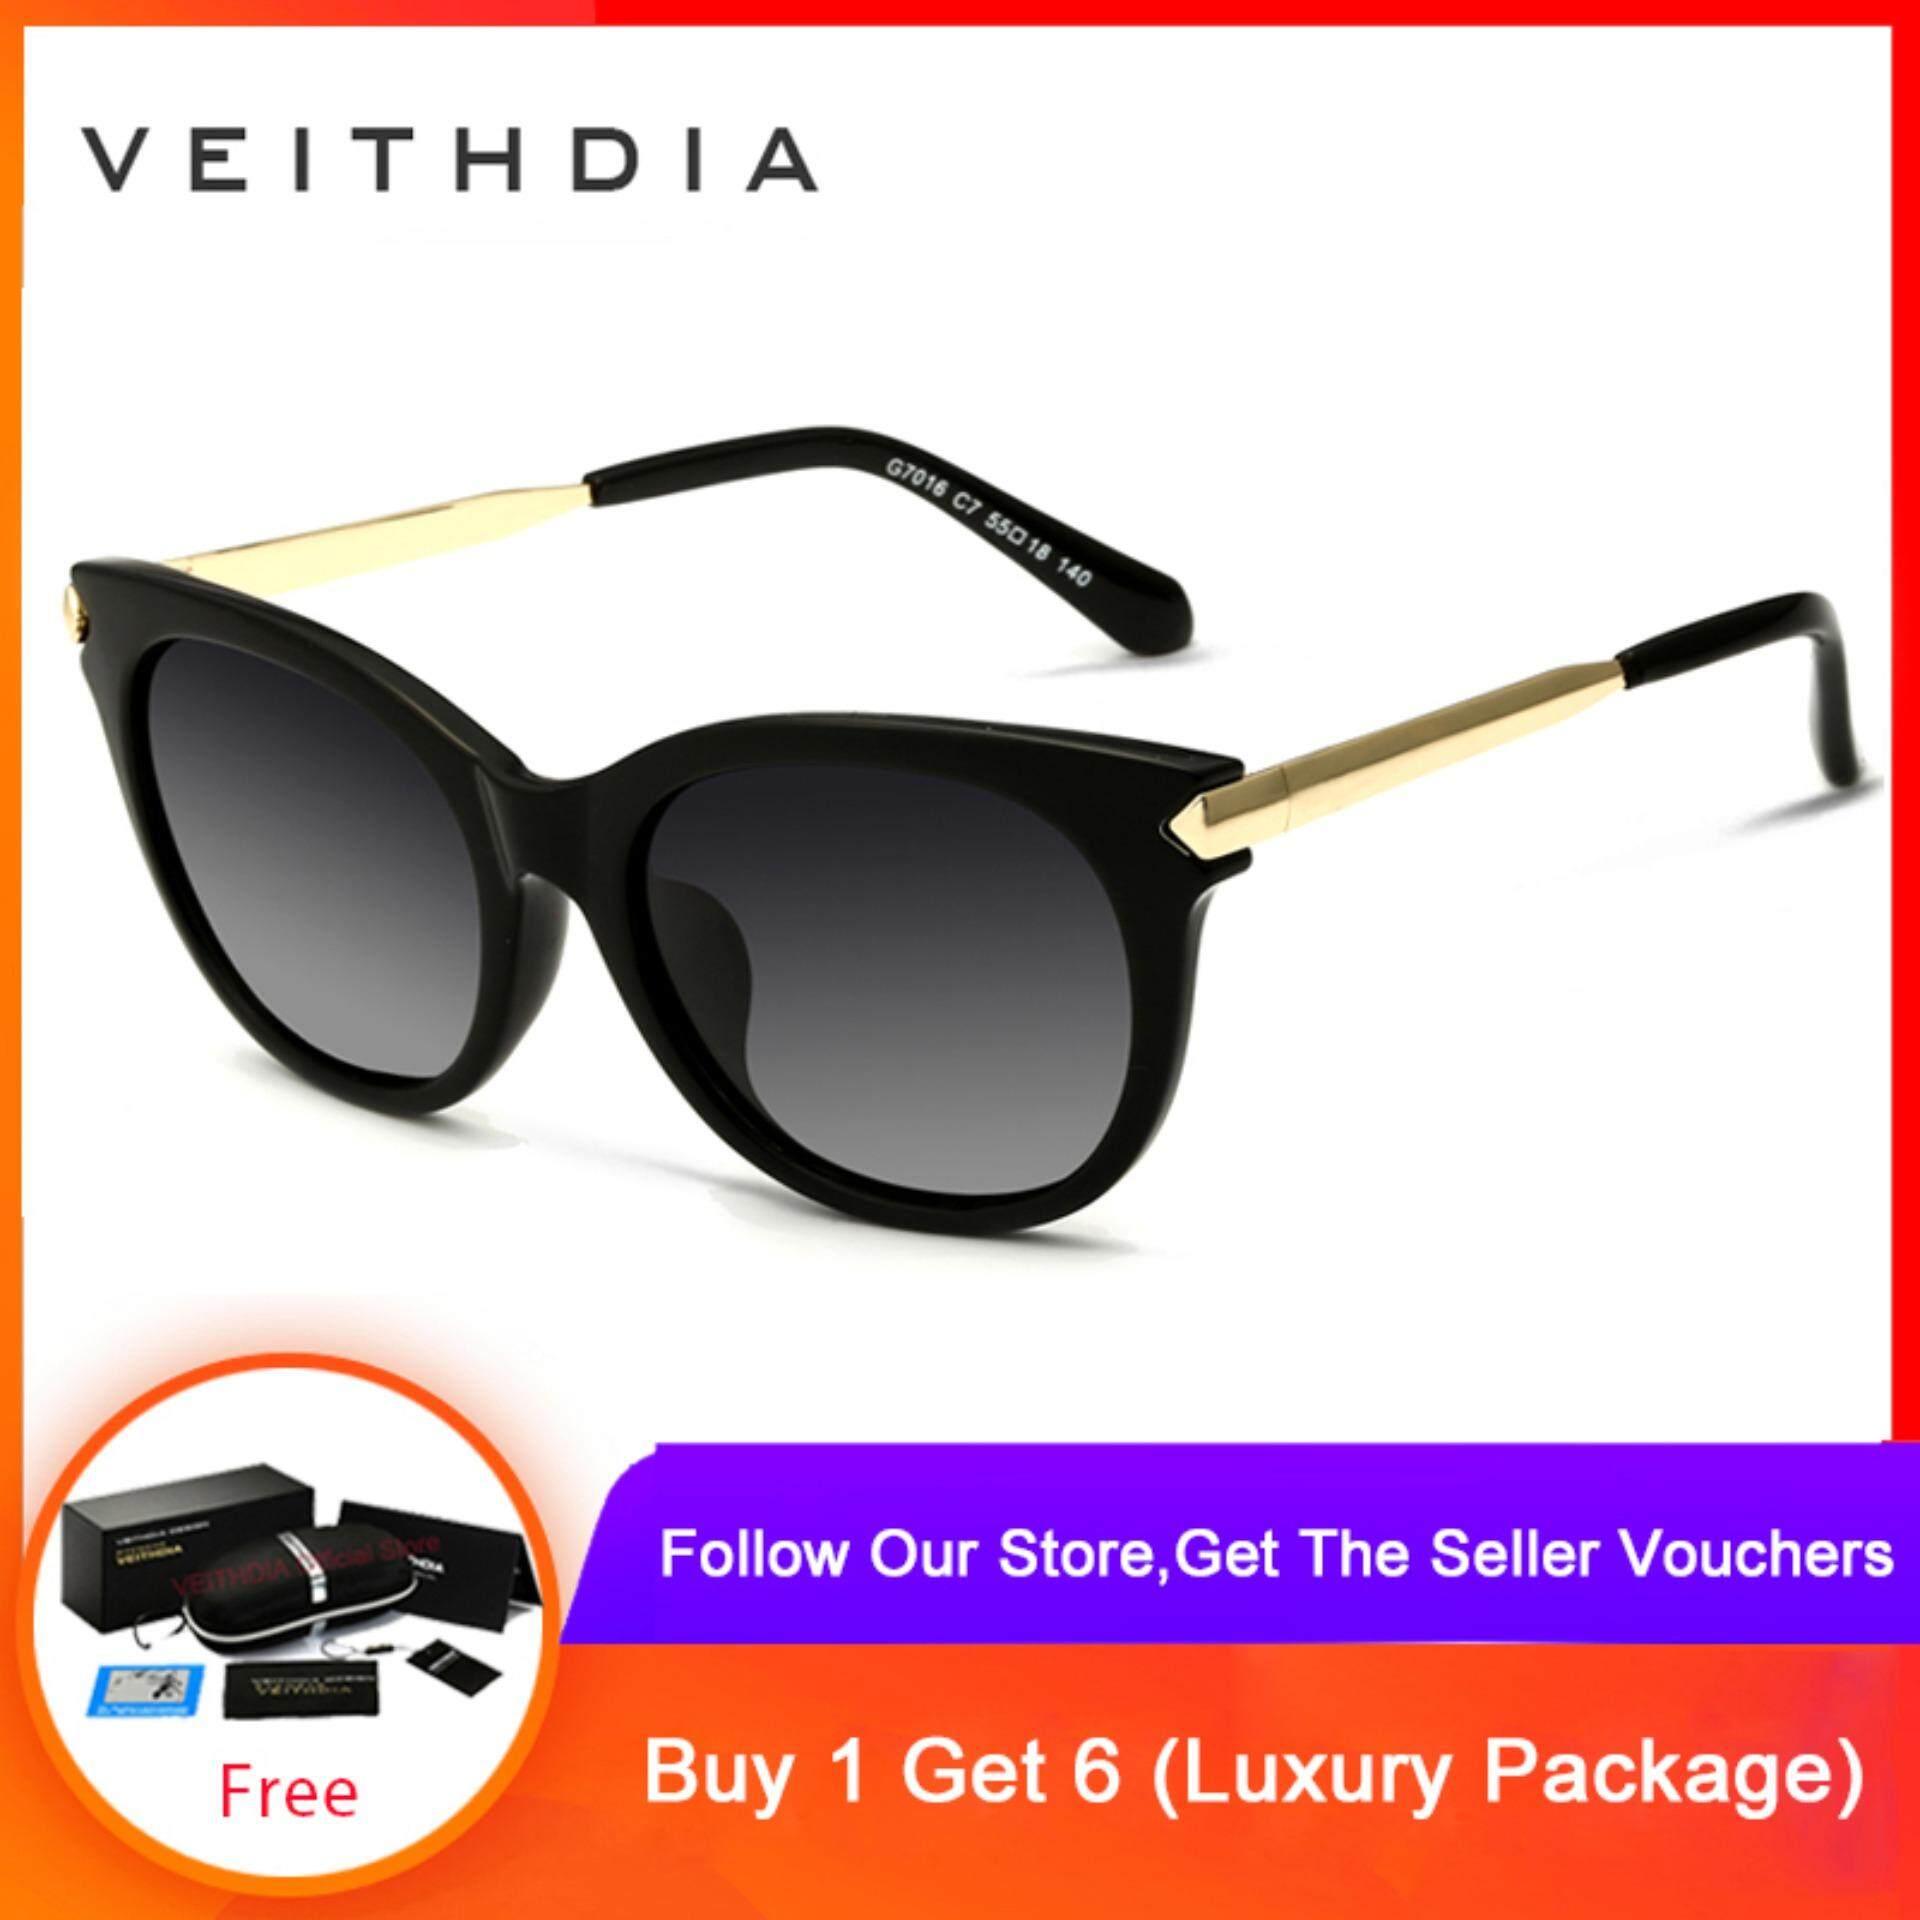 9601a70fa2fa3 VEITHDIA TR90 Sunglasses Polarized Cat Eye Ladies Designer Women Sunglasses  Eyewear Accessories Female 7016